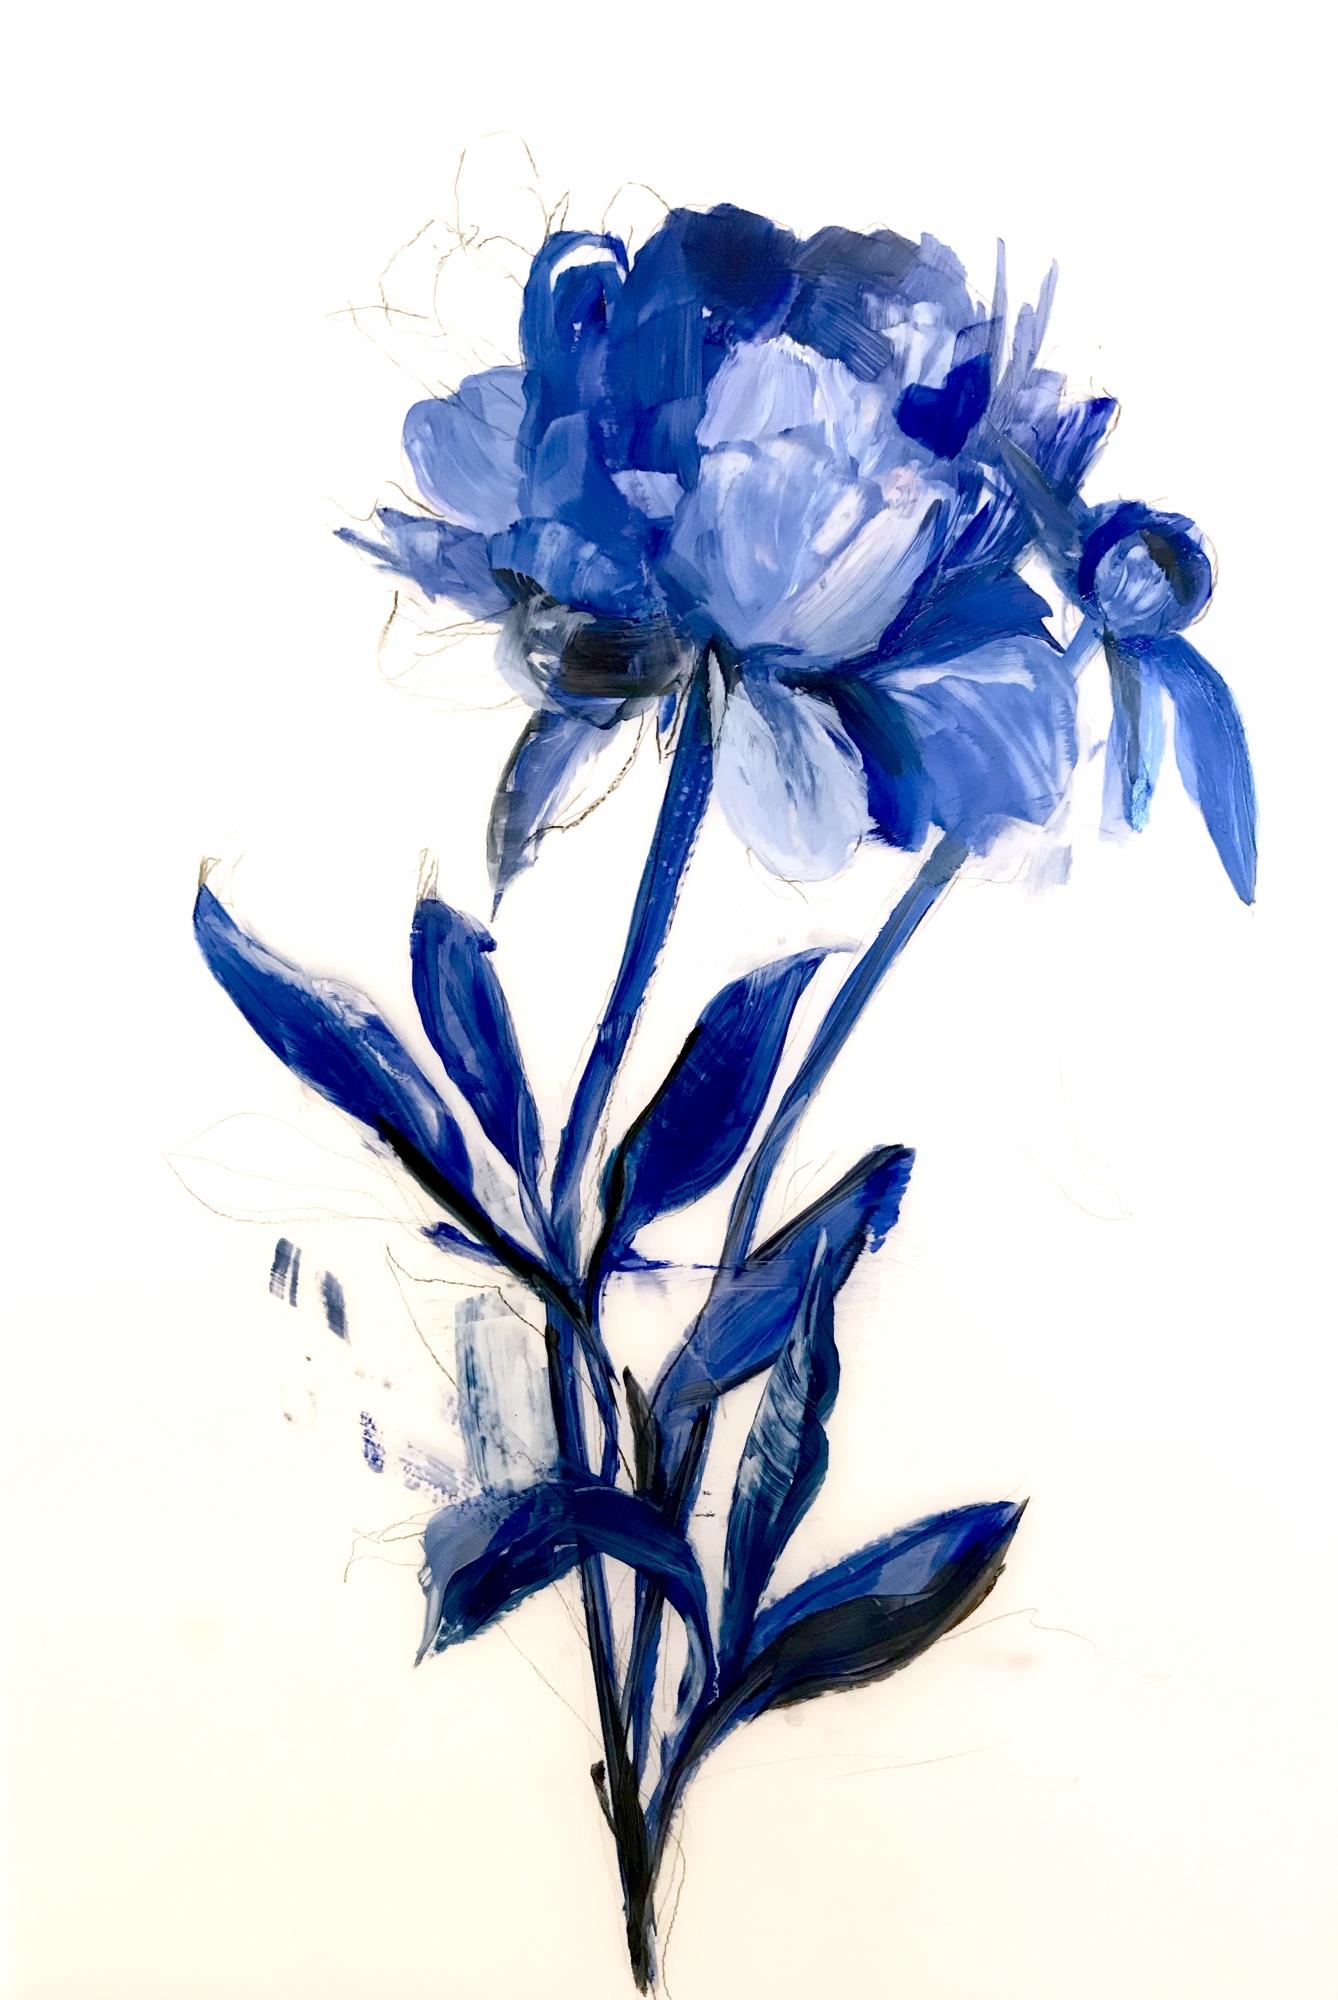 Deep Blue Peony 2 by Madeleine Lamont